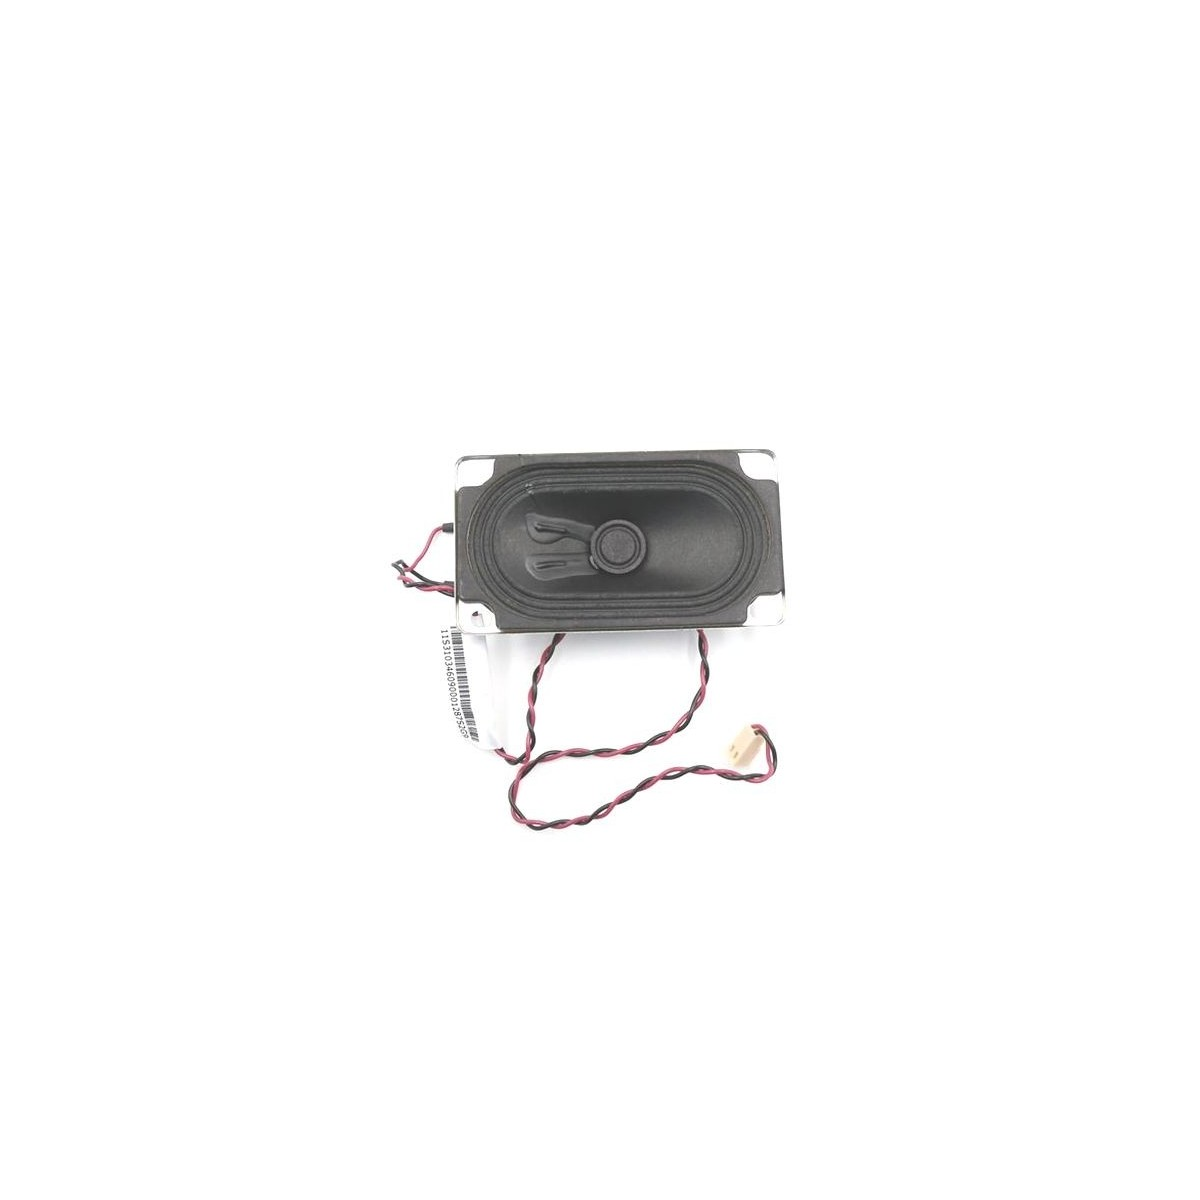 BLADE HP BL660C G8 2xE5-4620 8CORE 32GB 0HDD P220i